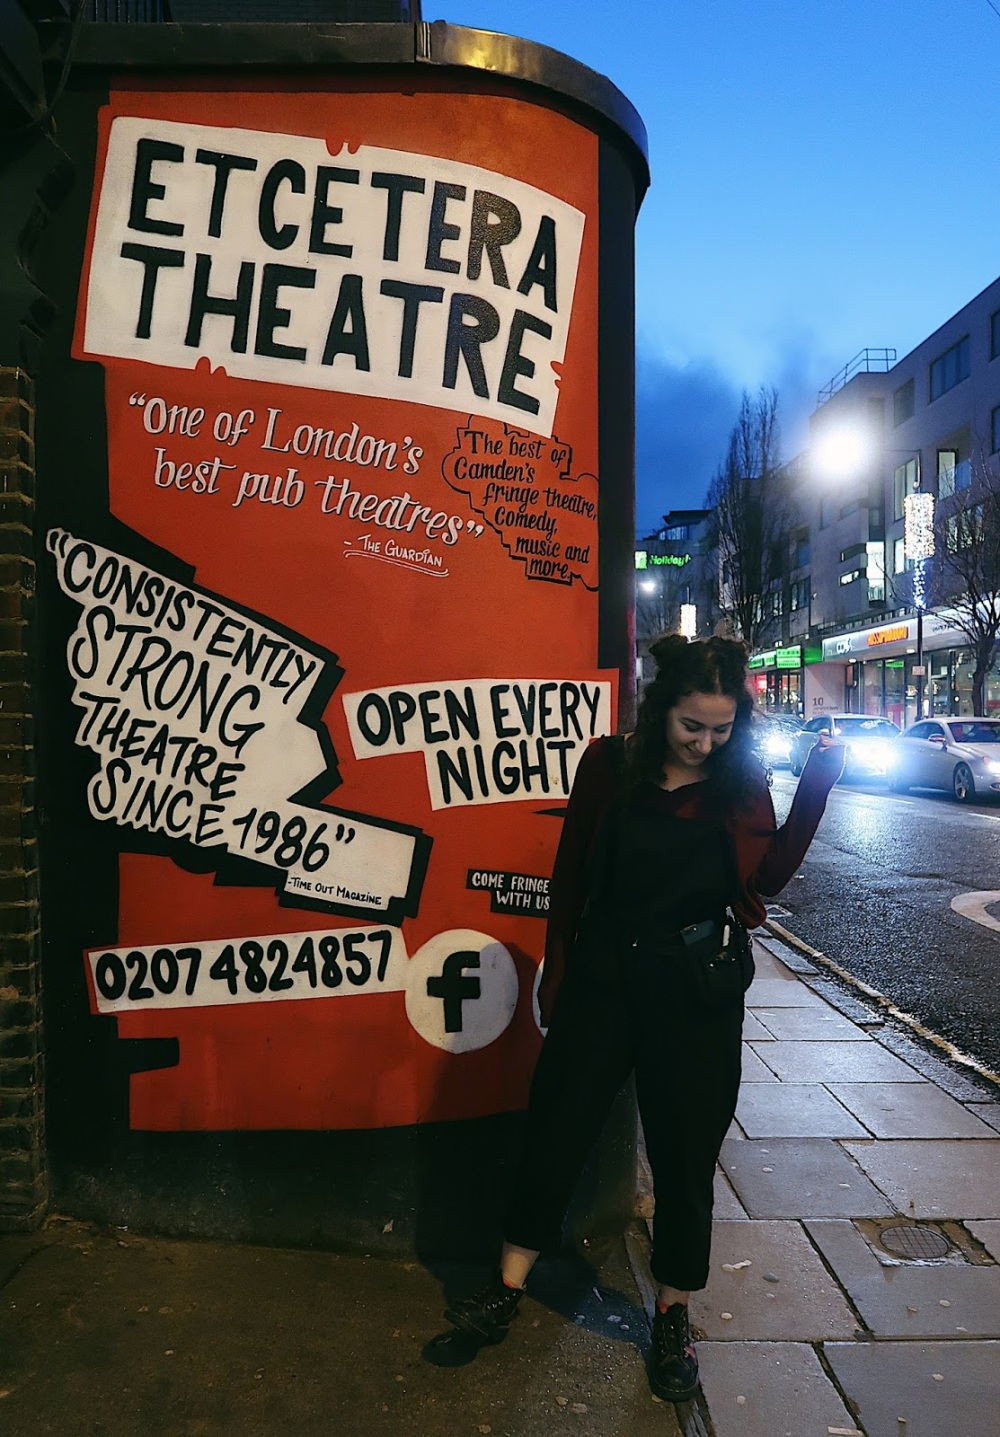 Etcetera theatre, Camden